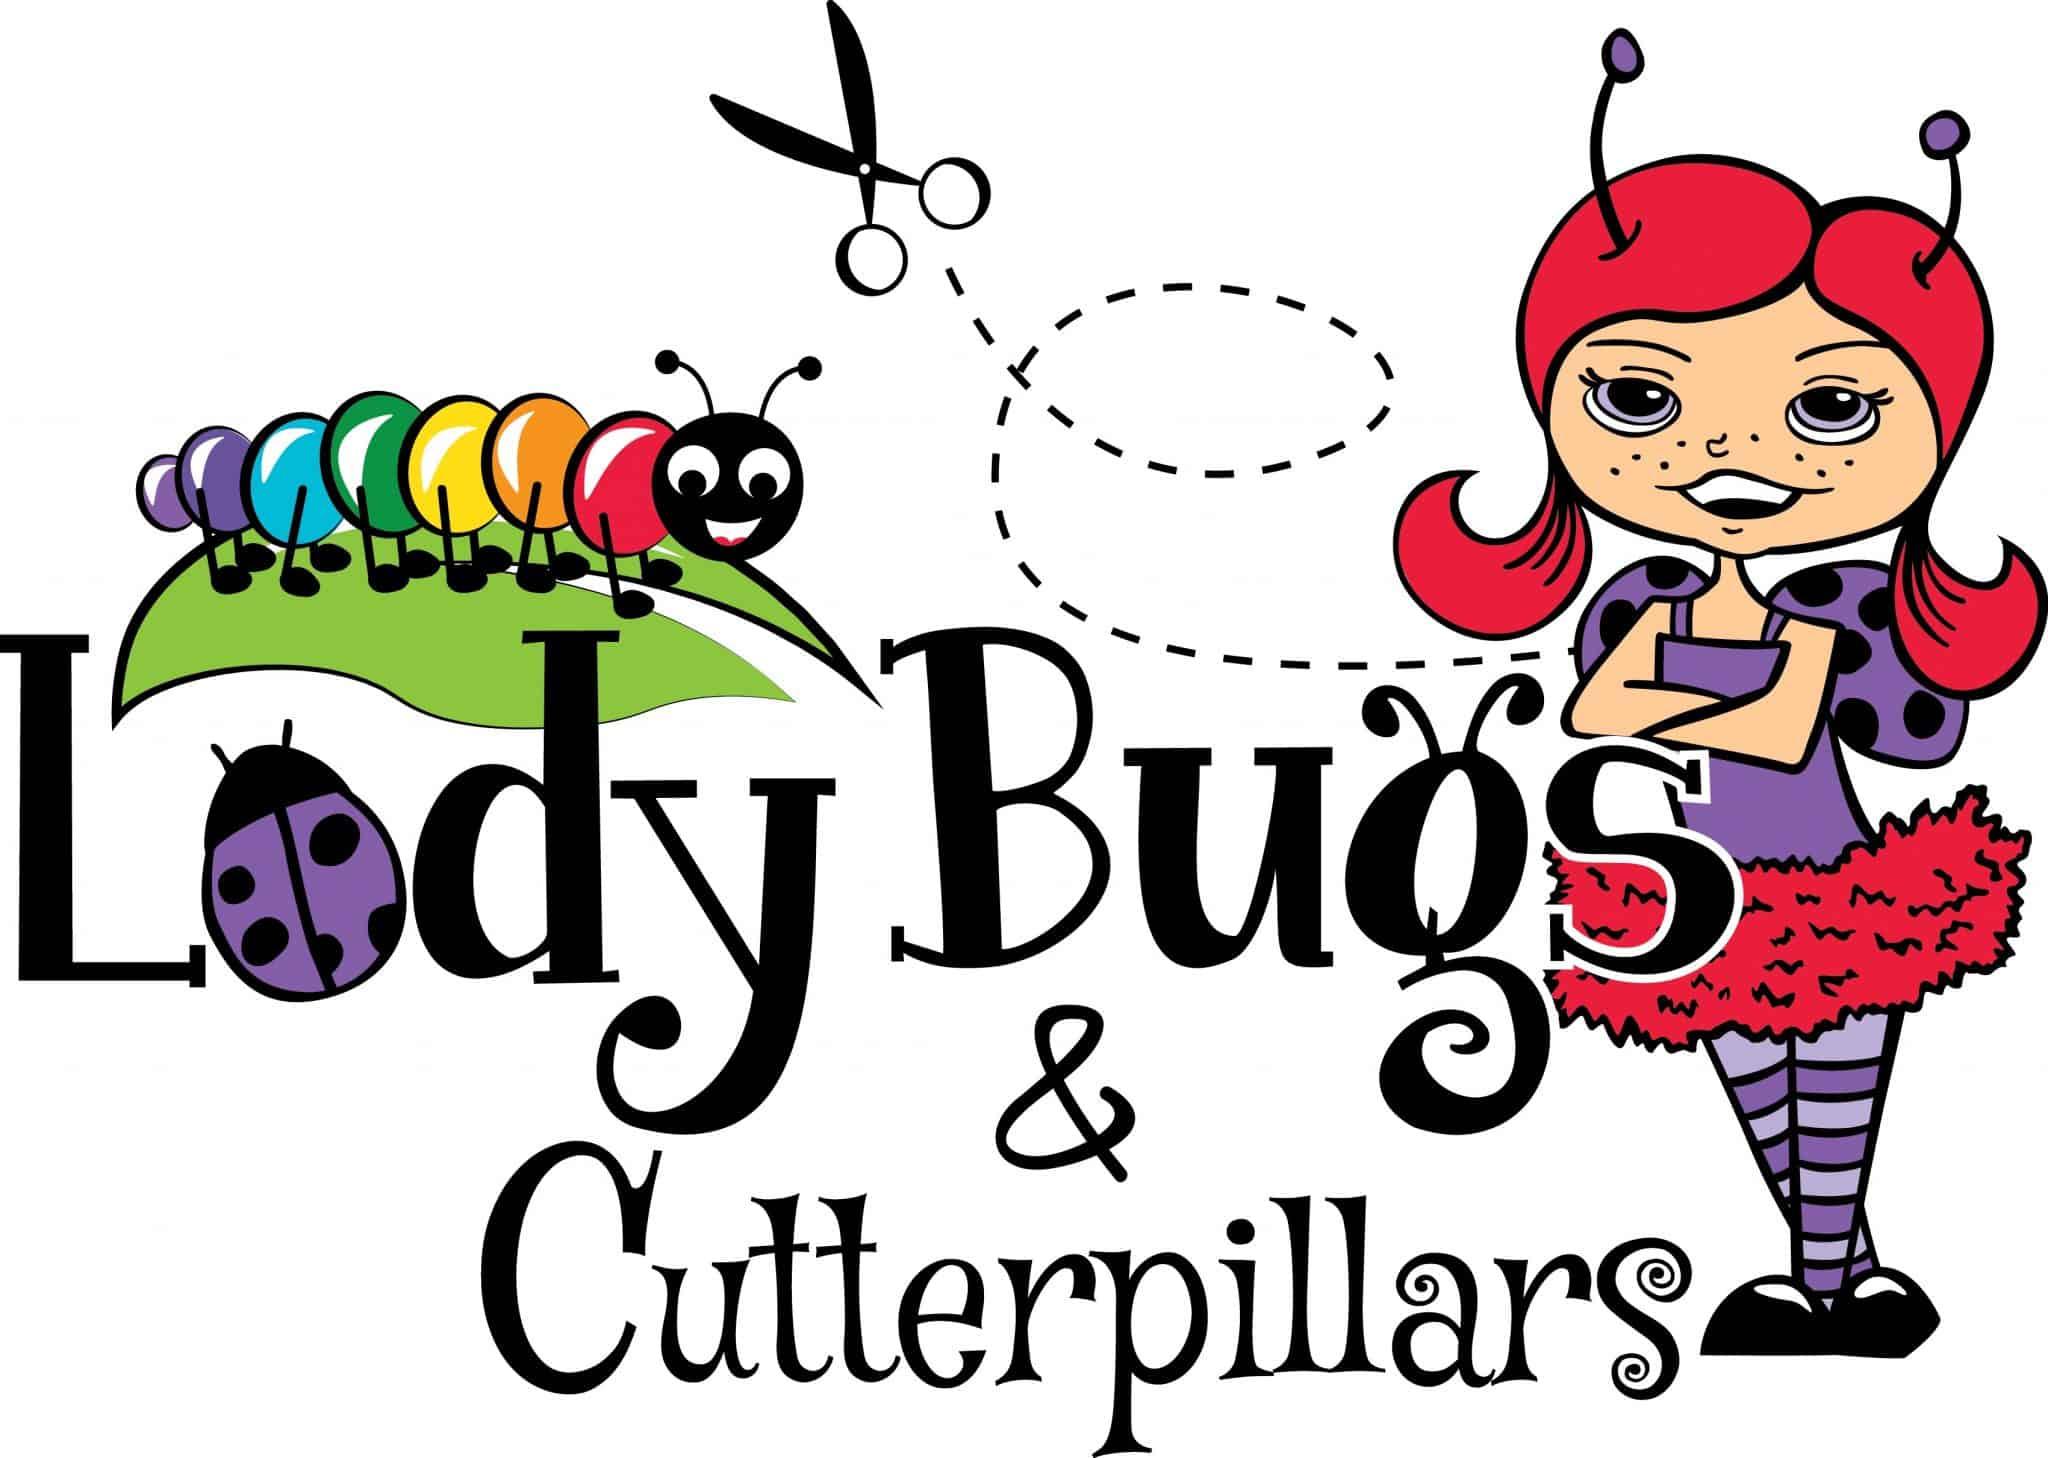 Ladybugs and Cutterpillars